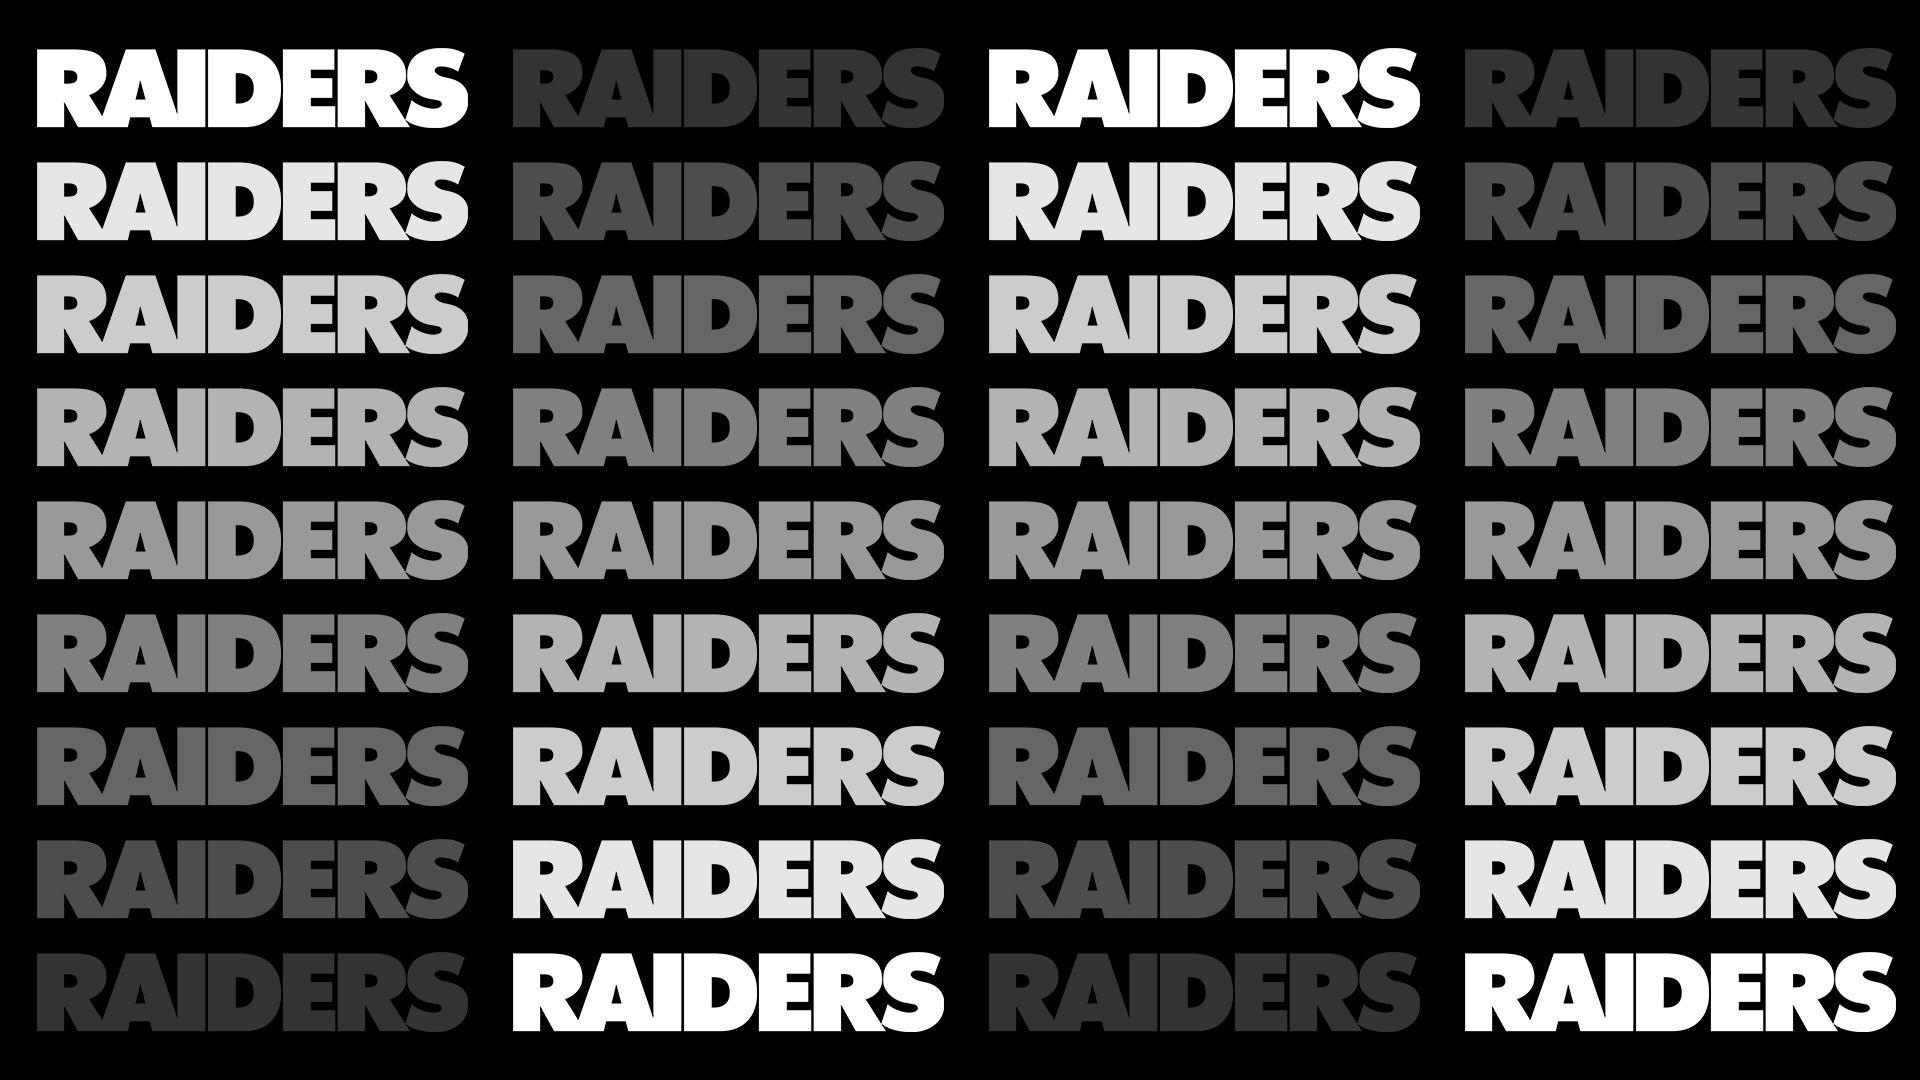 Video Conference Backgrounds Las Vegas Raiders Raiderscom 1920x1080